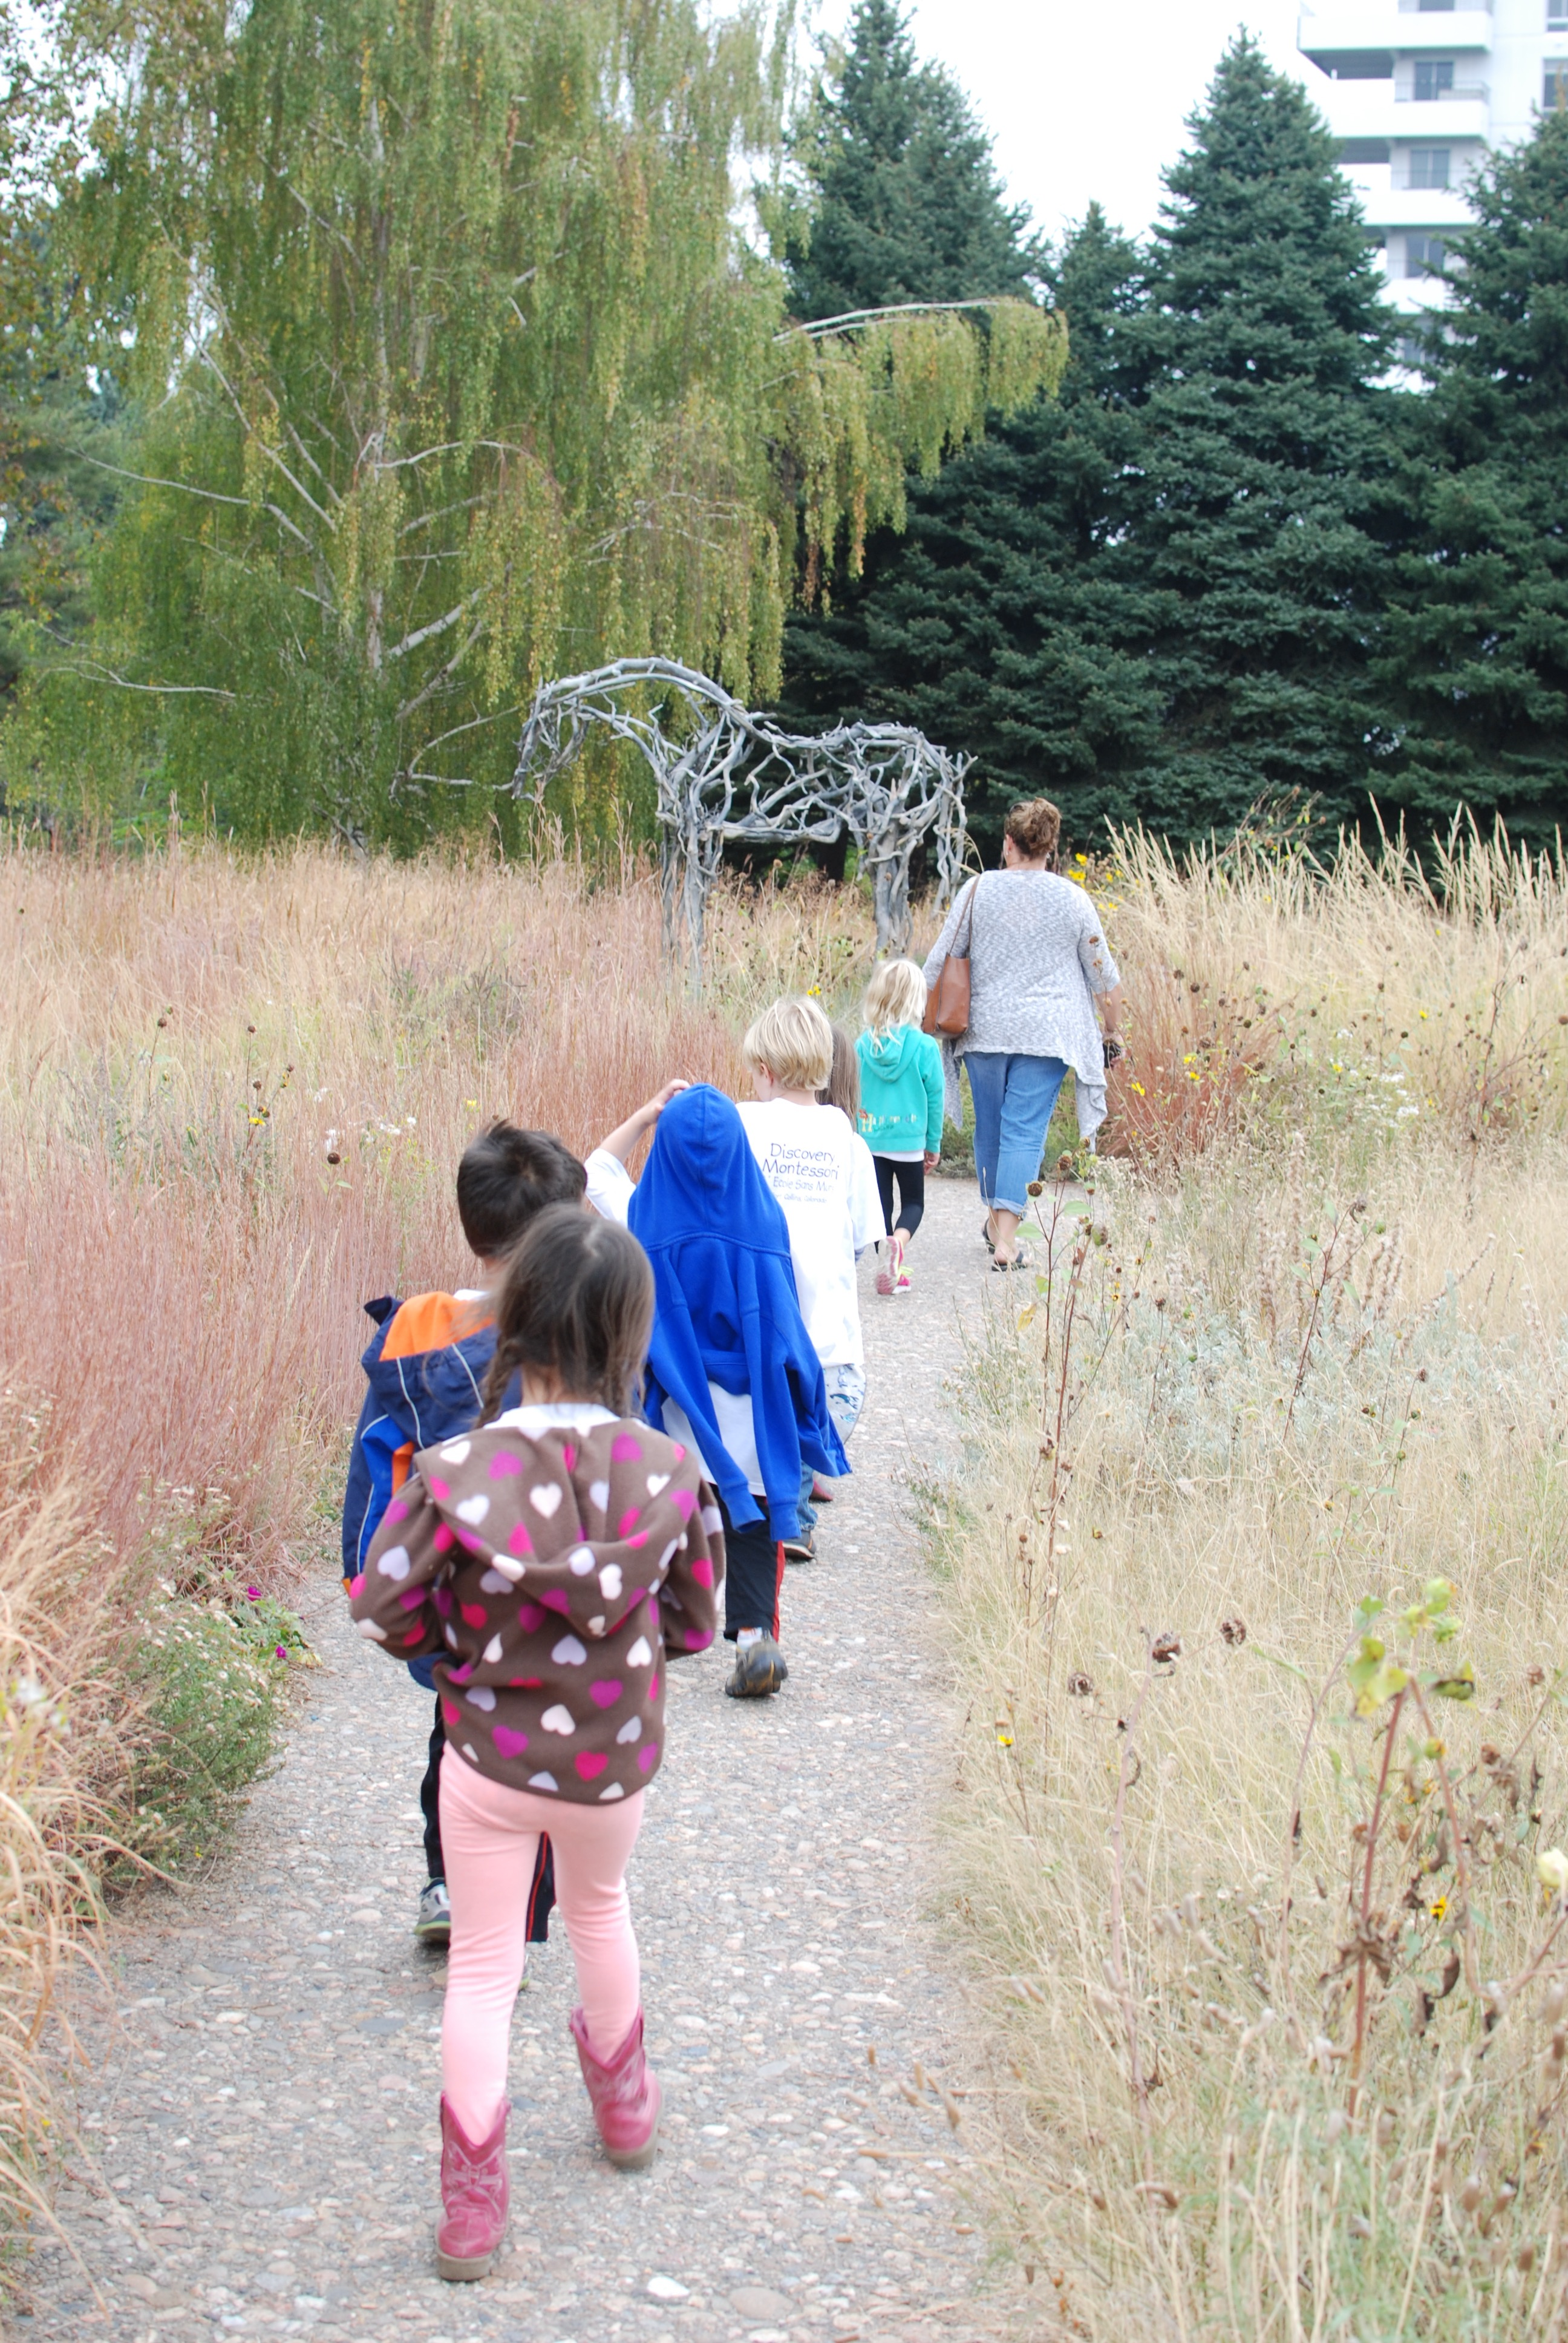 Kindergartners on an adventure through the Denver Botanic Gardens